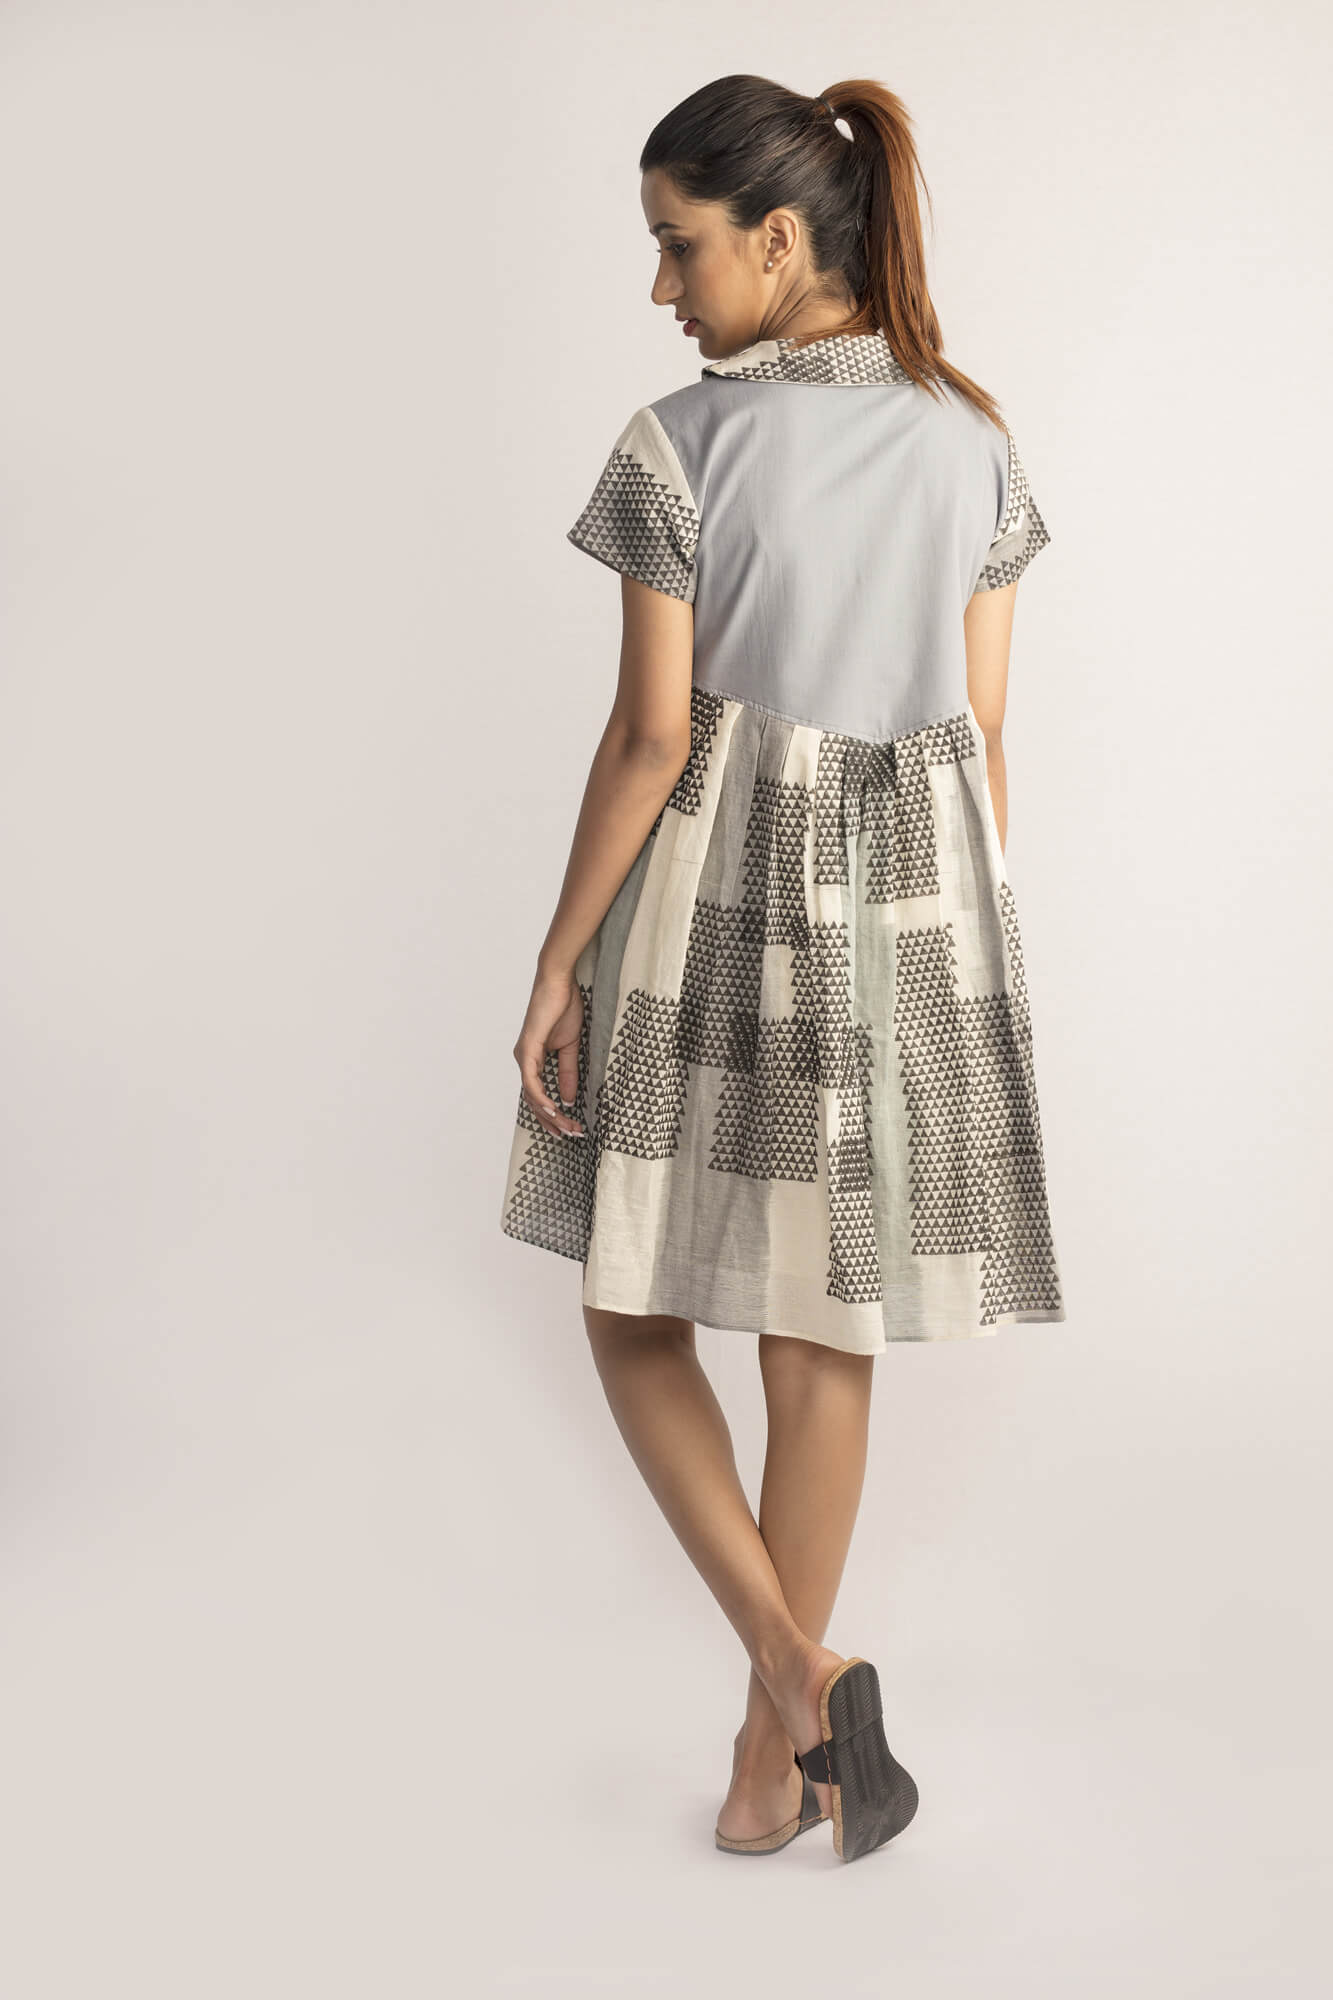 Ikat Collared Dress By TAMASQ